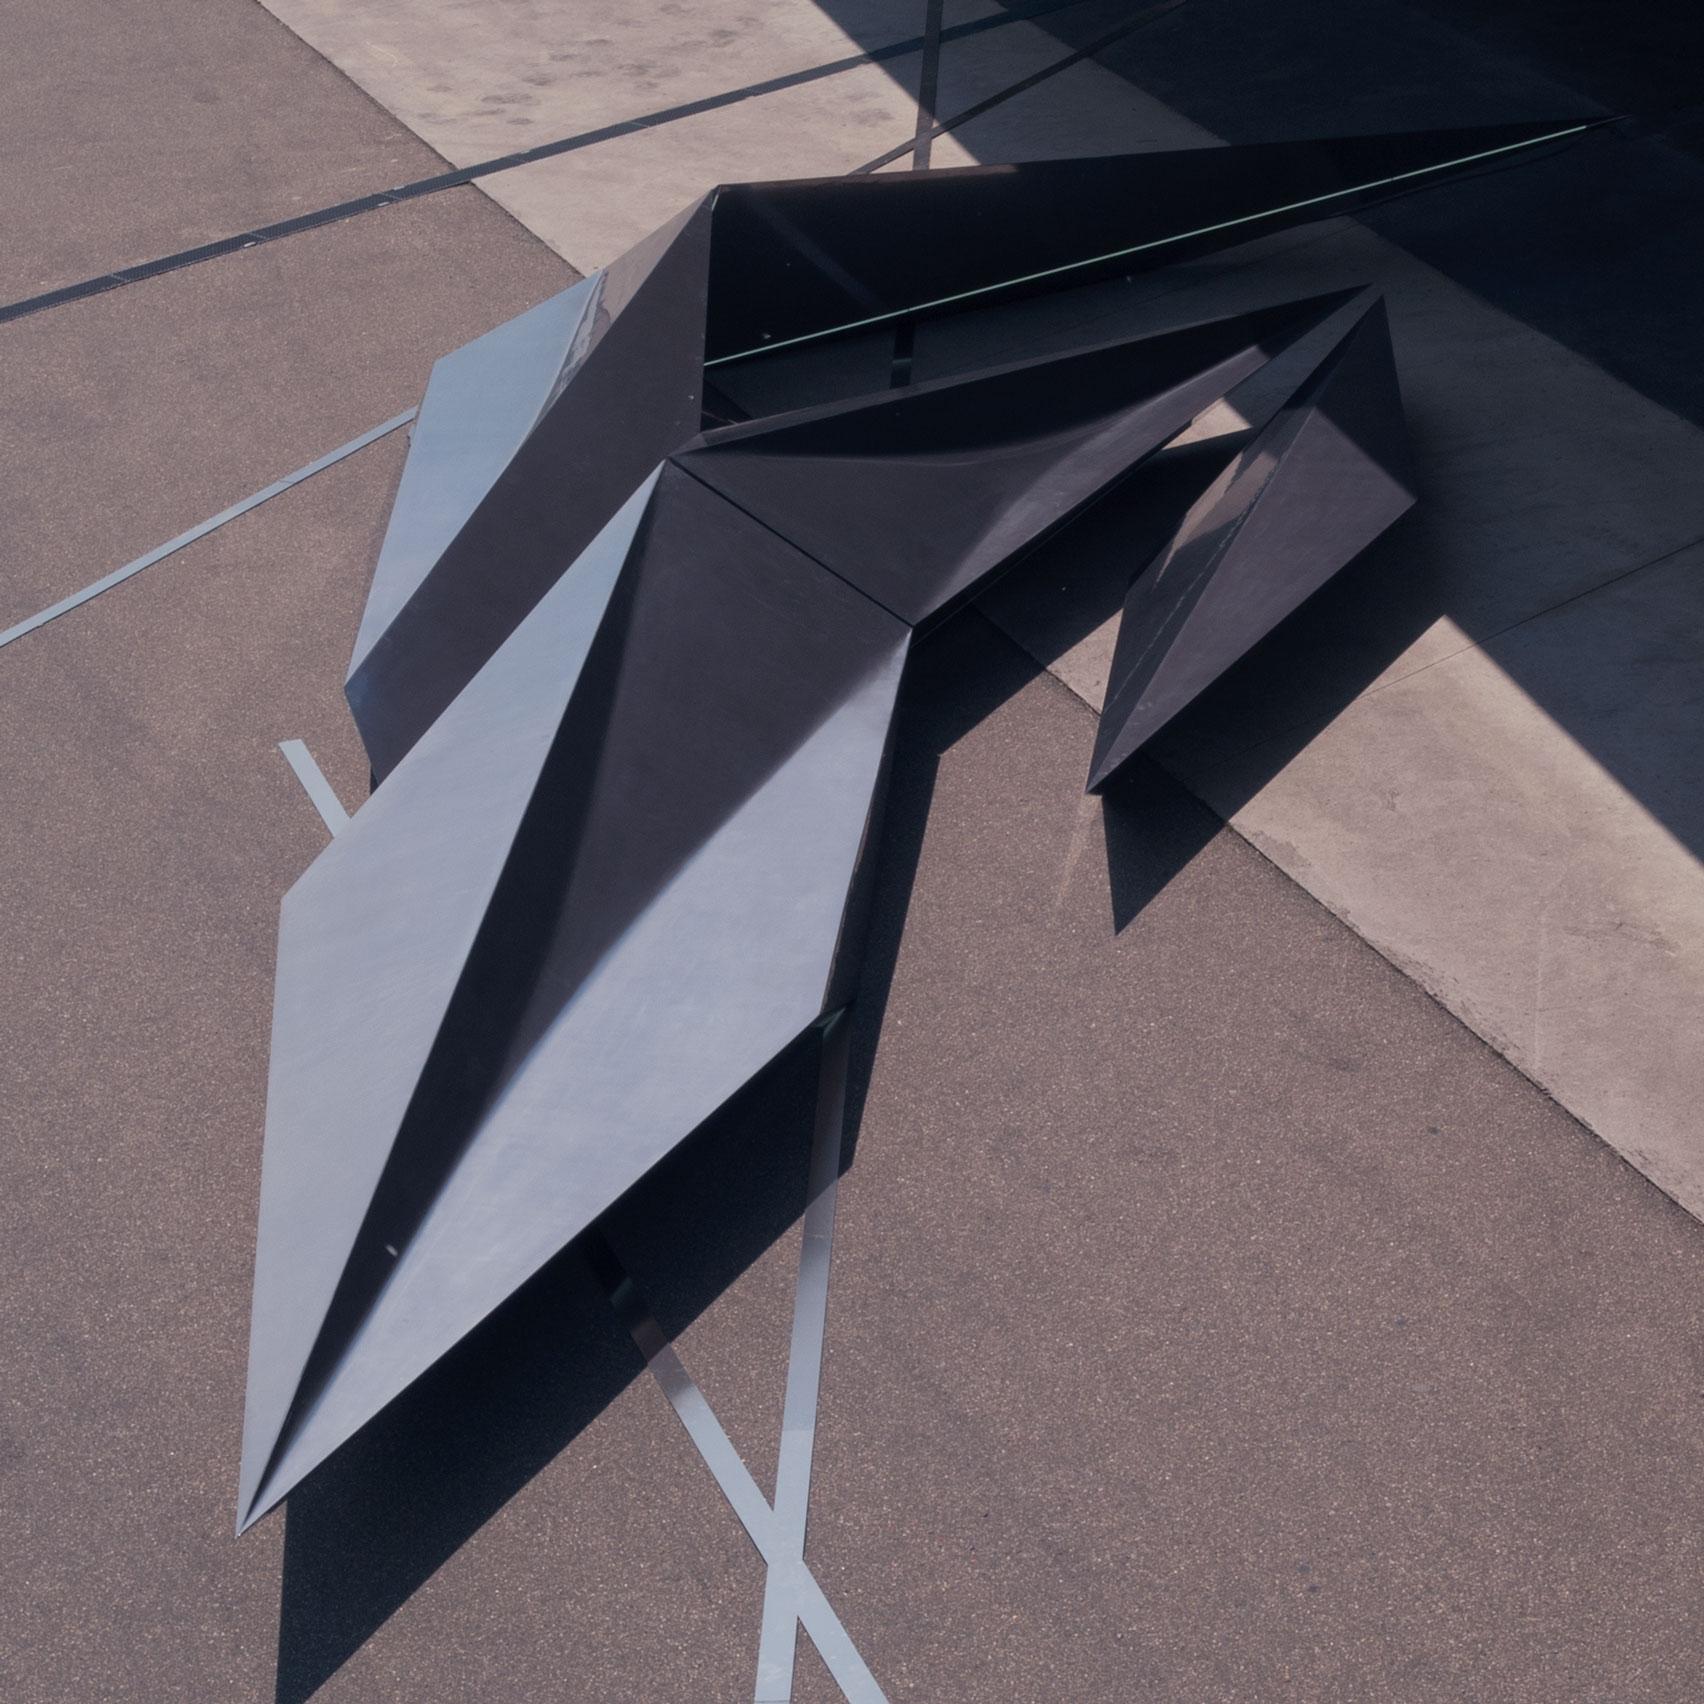 The 2013 Prima Installation by Zaha Hadid